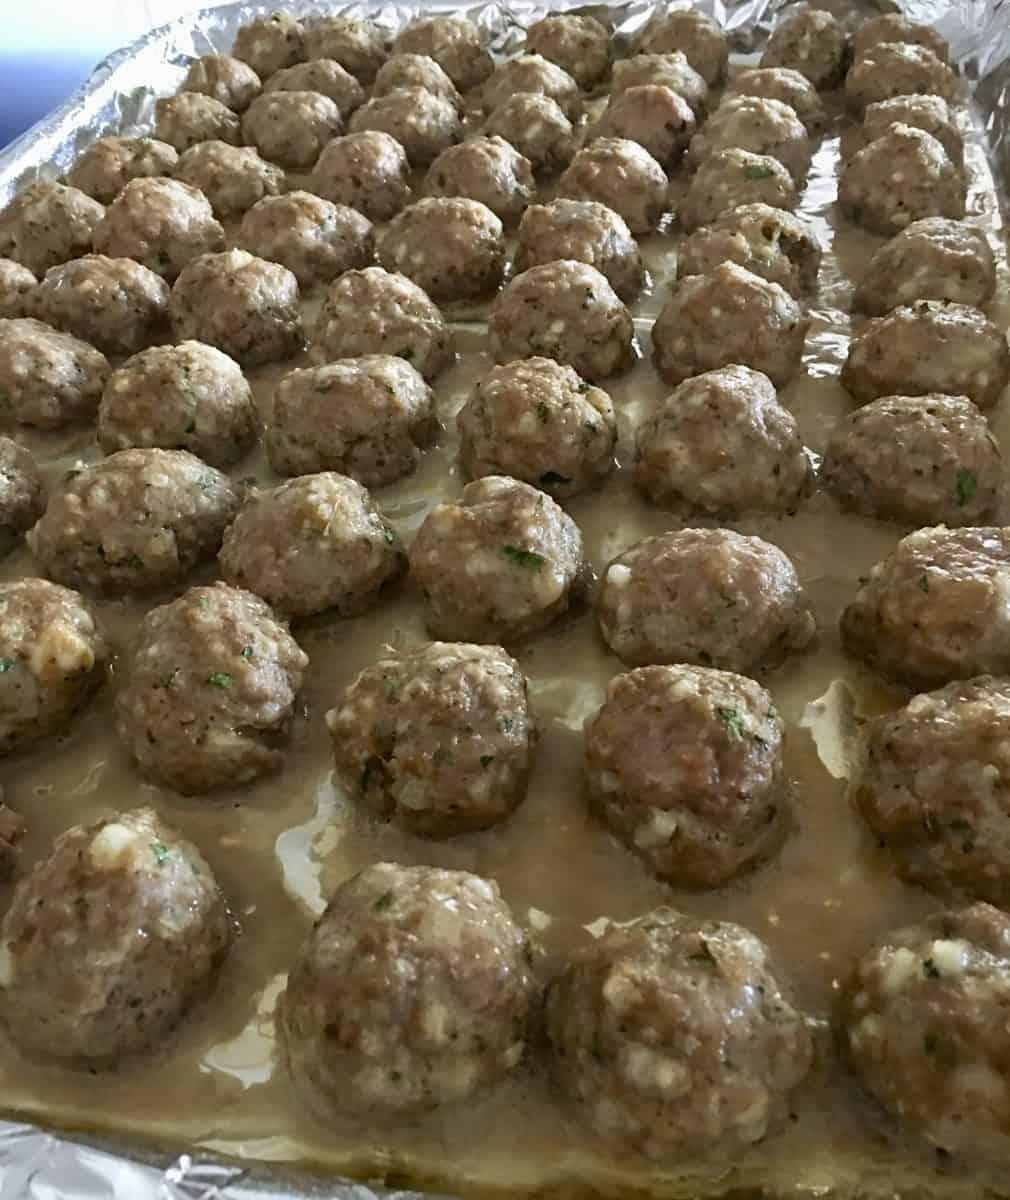 baked meatballs on a foil lined baking sheet